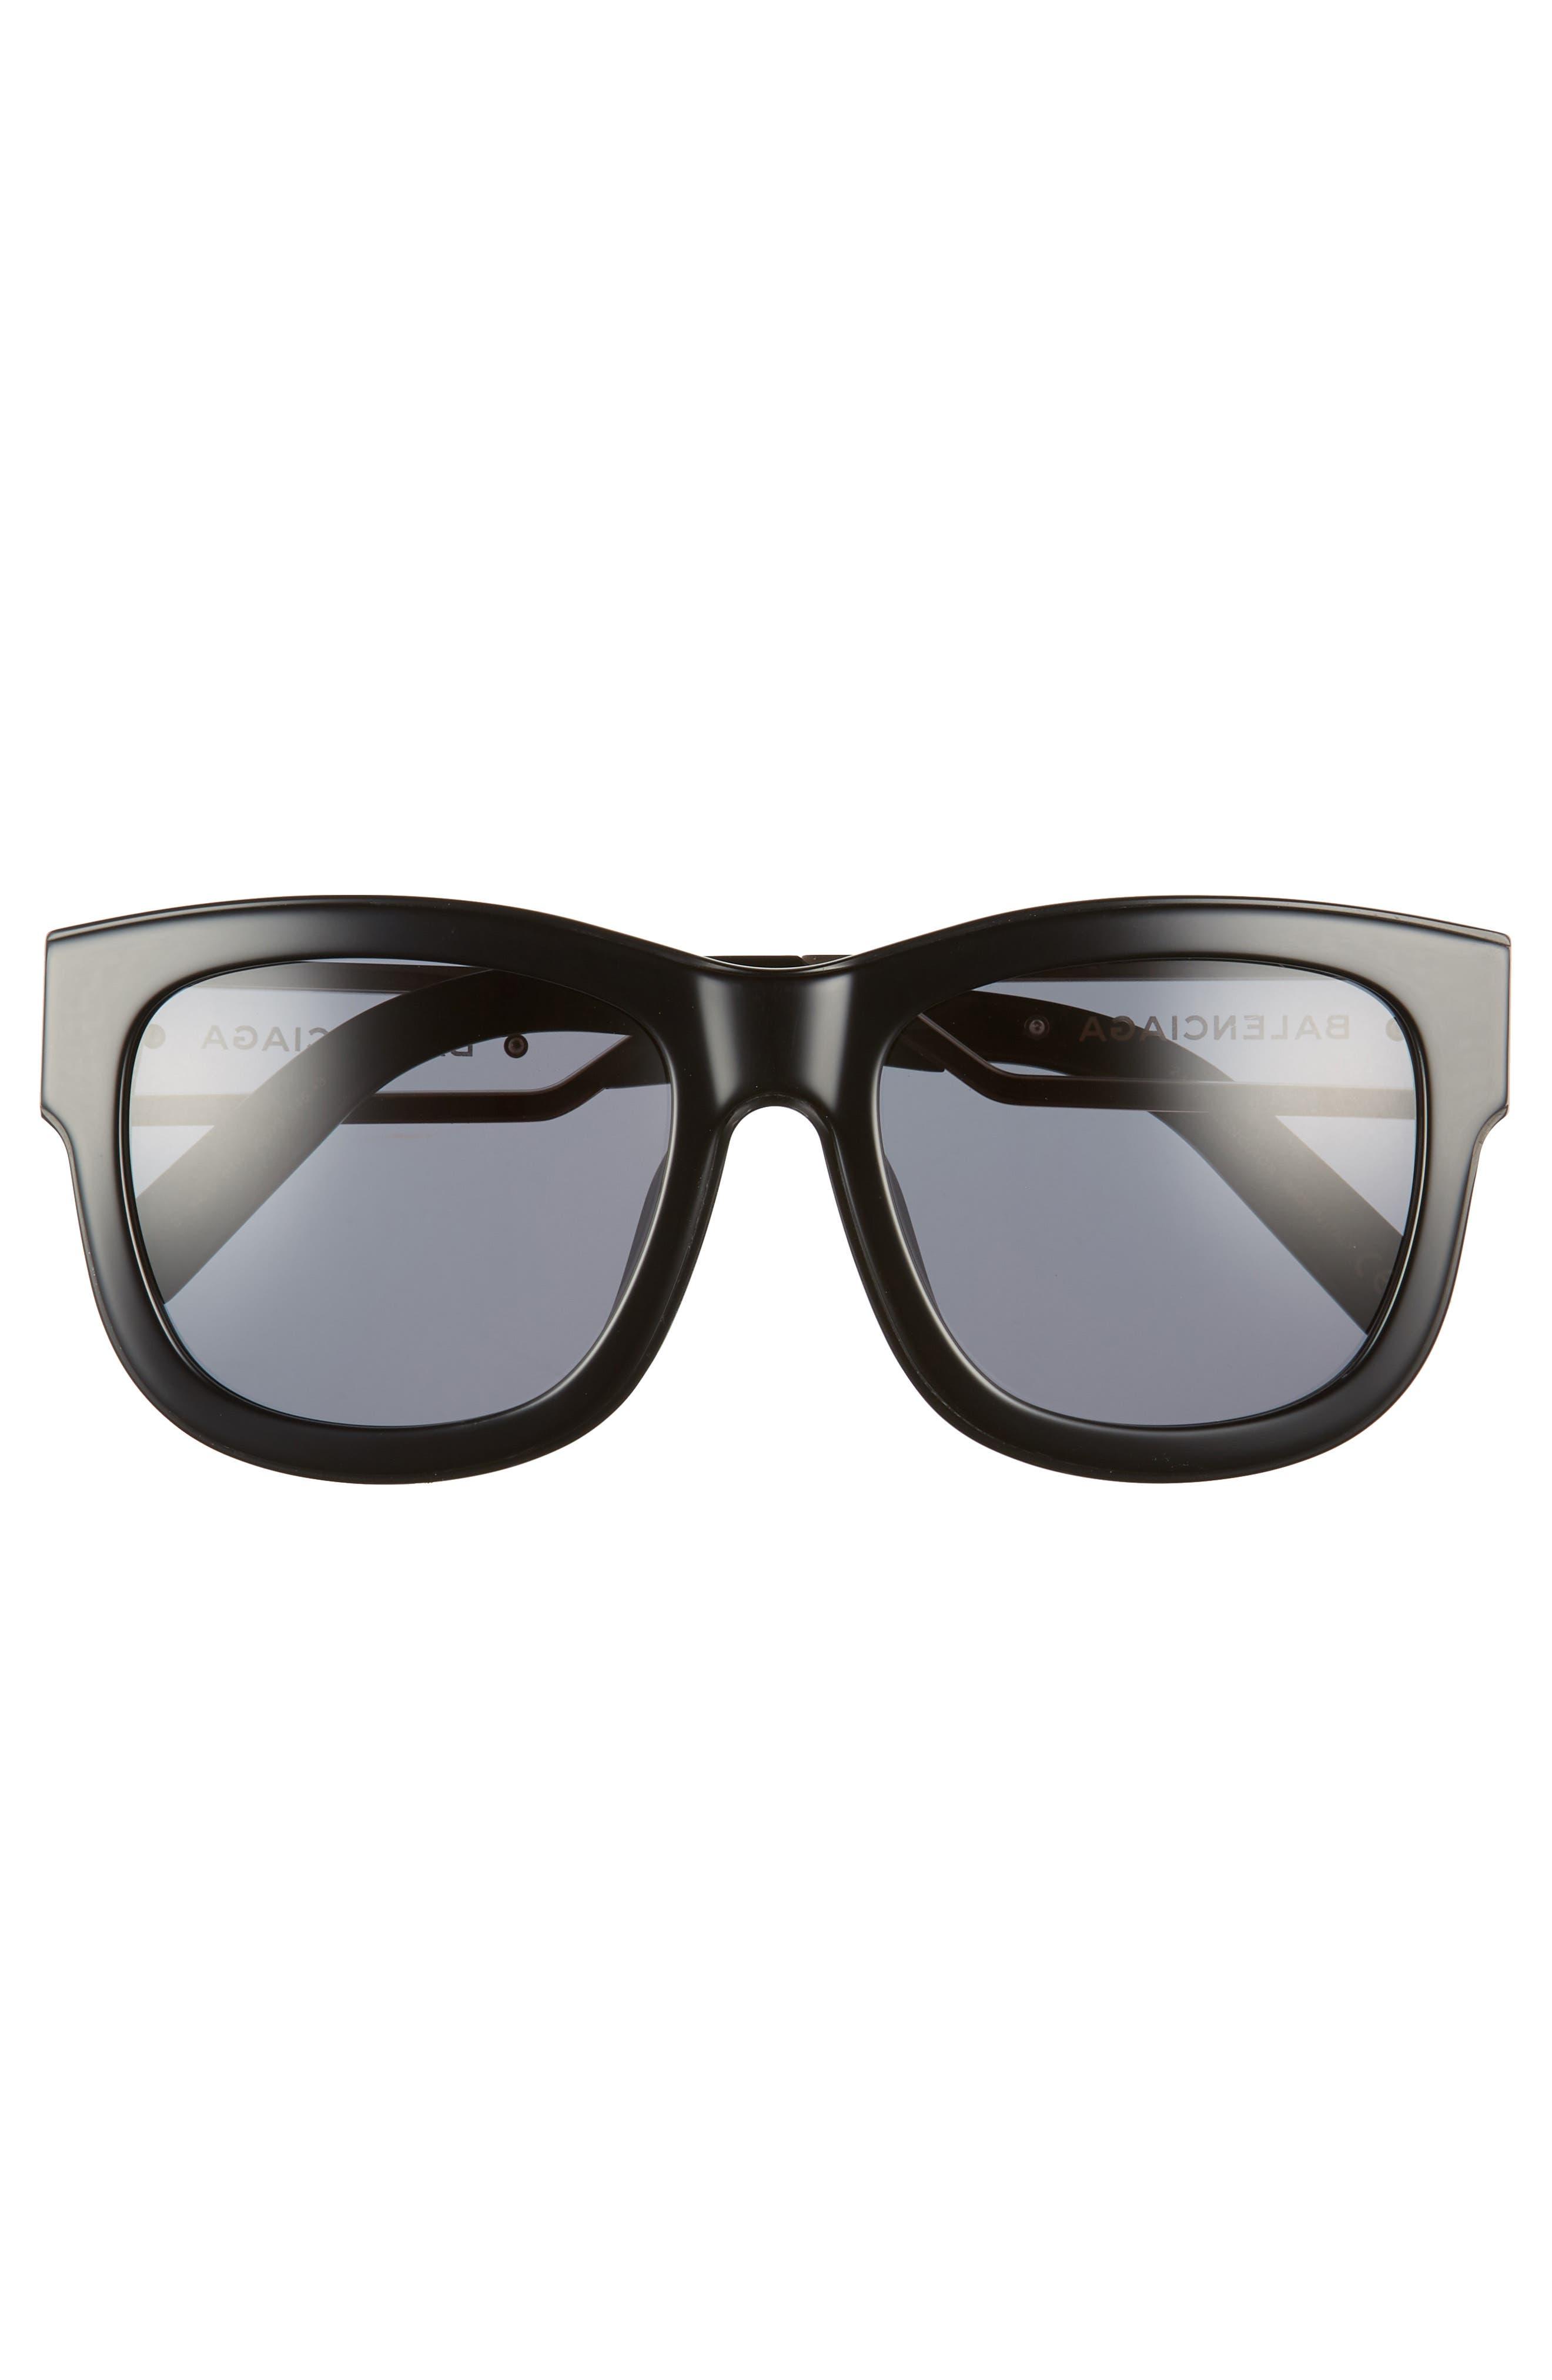 BALENCIAGA,                             56mm Cat Eye Sunglasses,                             Alternate thumbnail 3, color,                             018